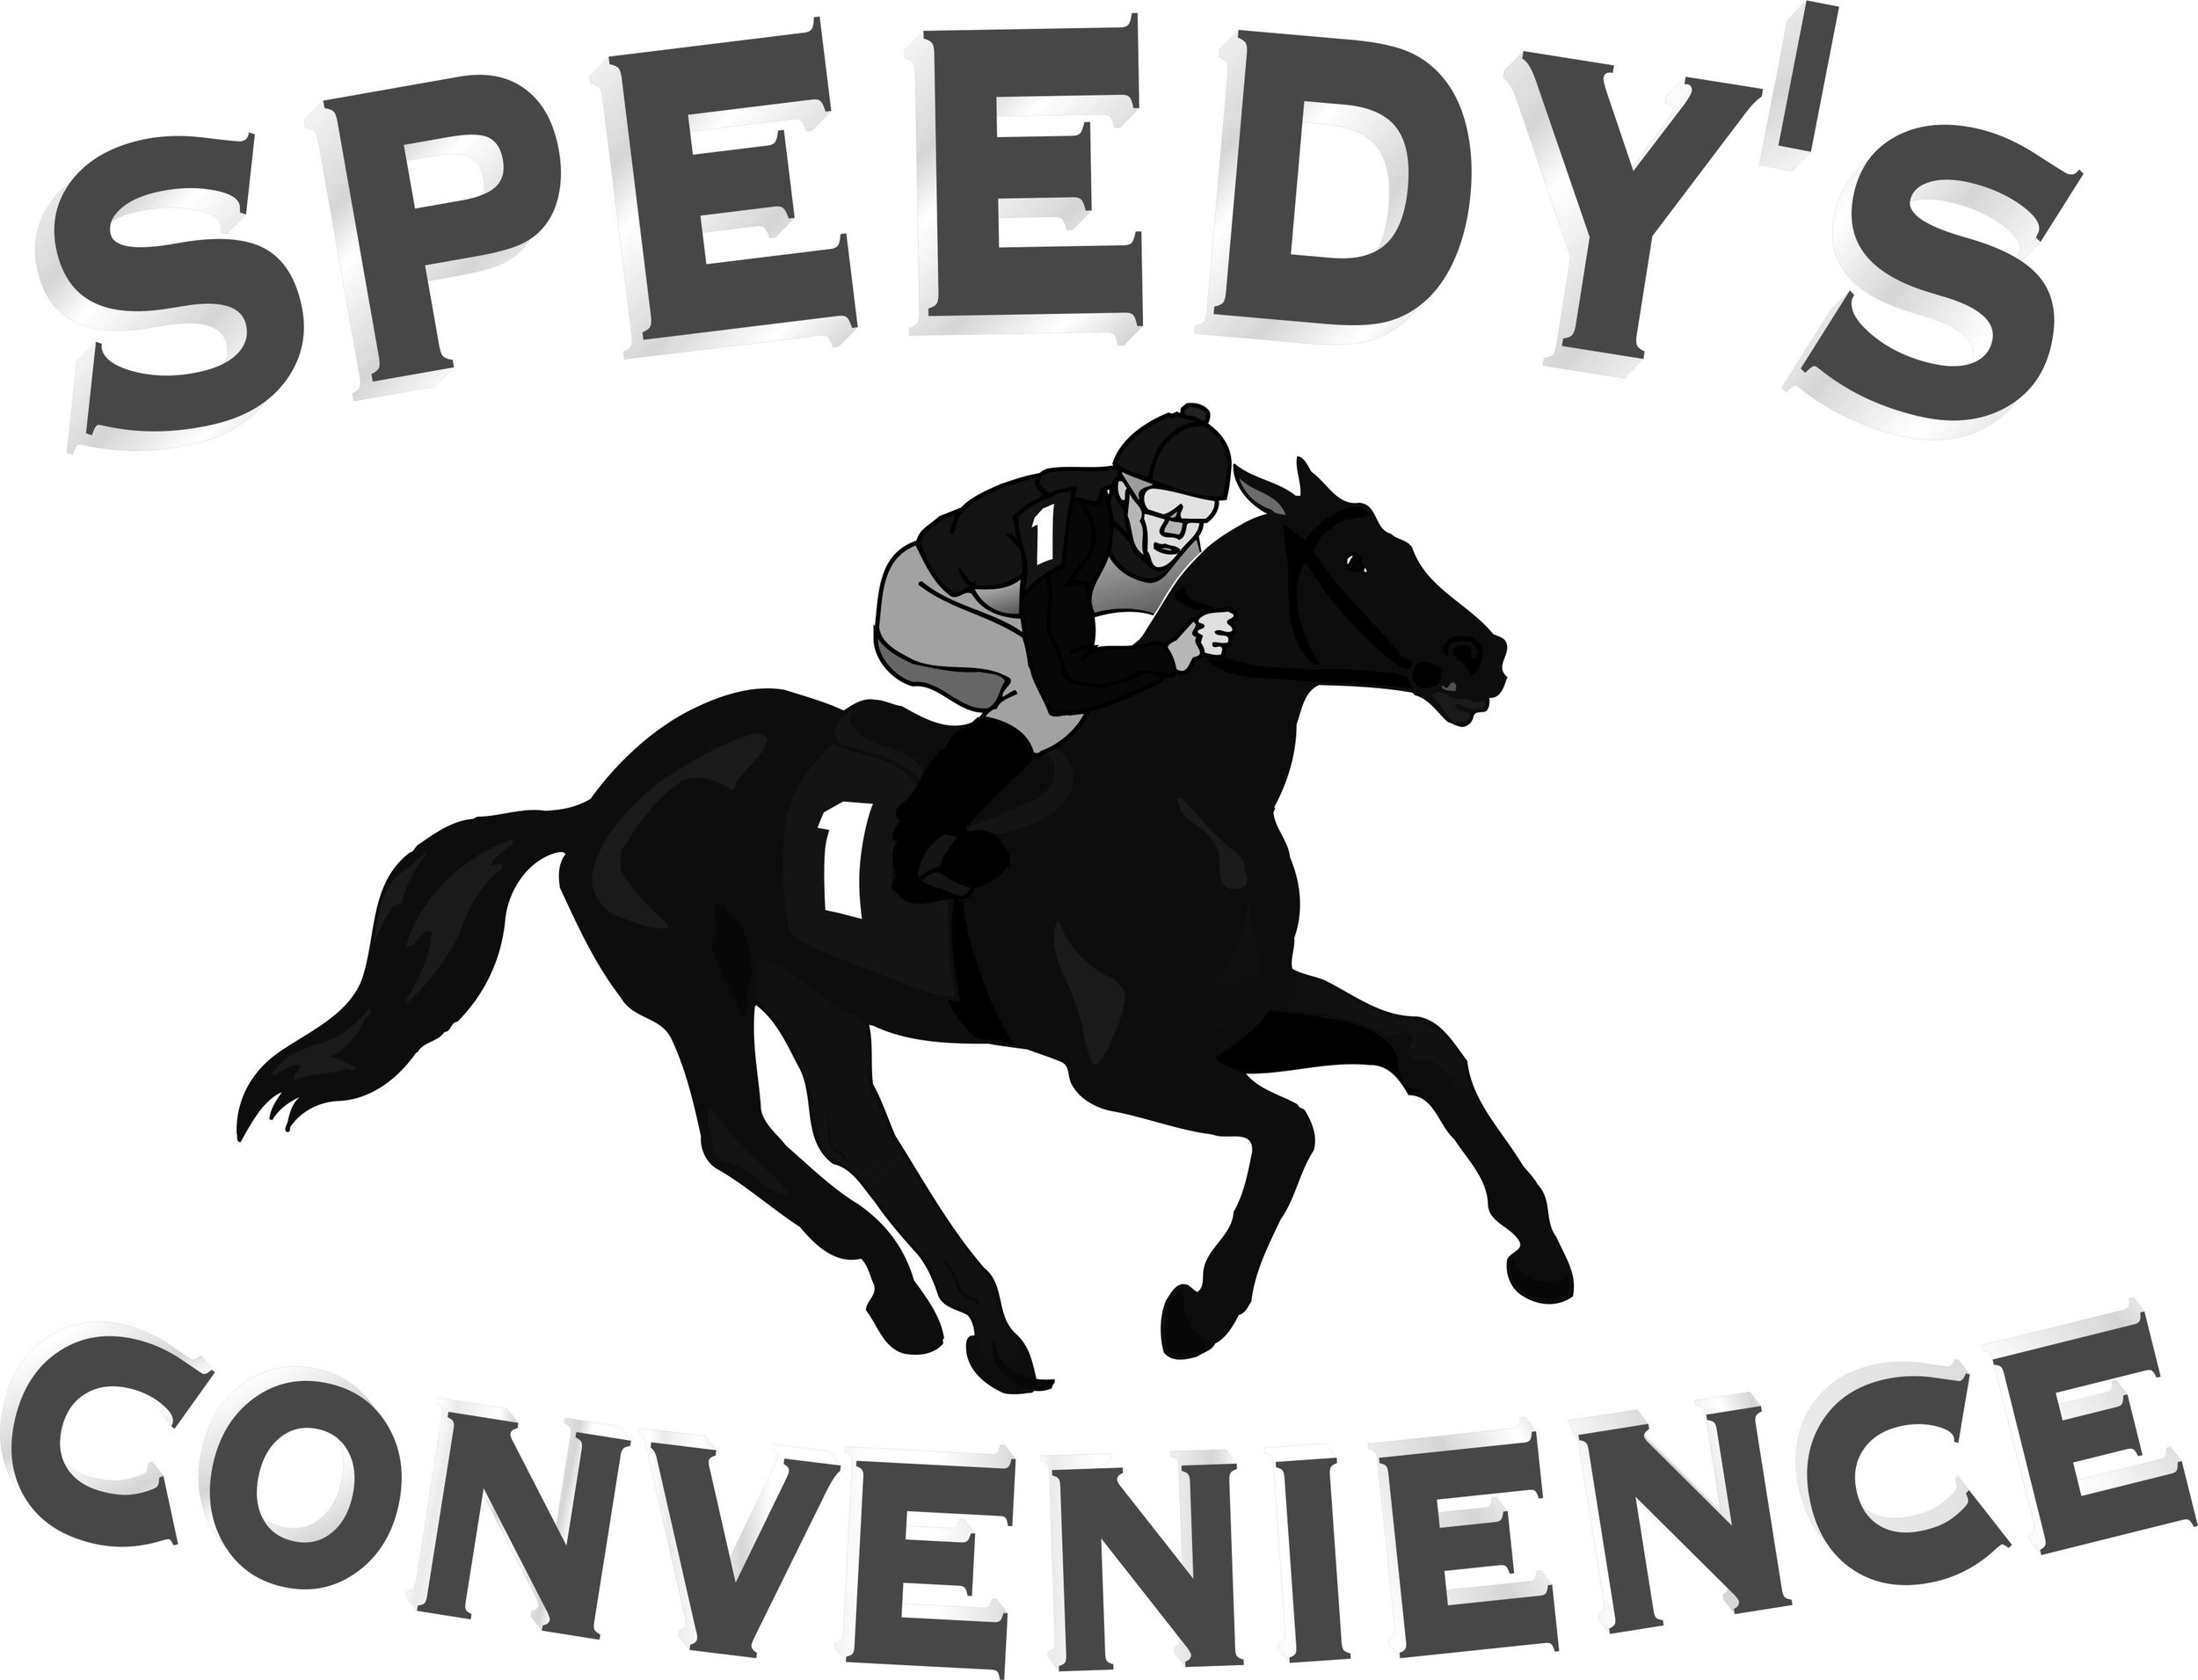 Copy of speedys greyscale logo.jpg